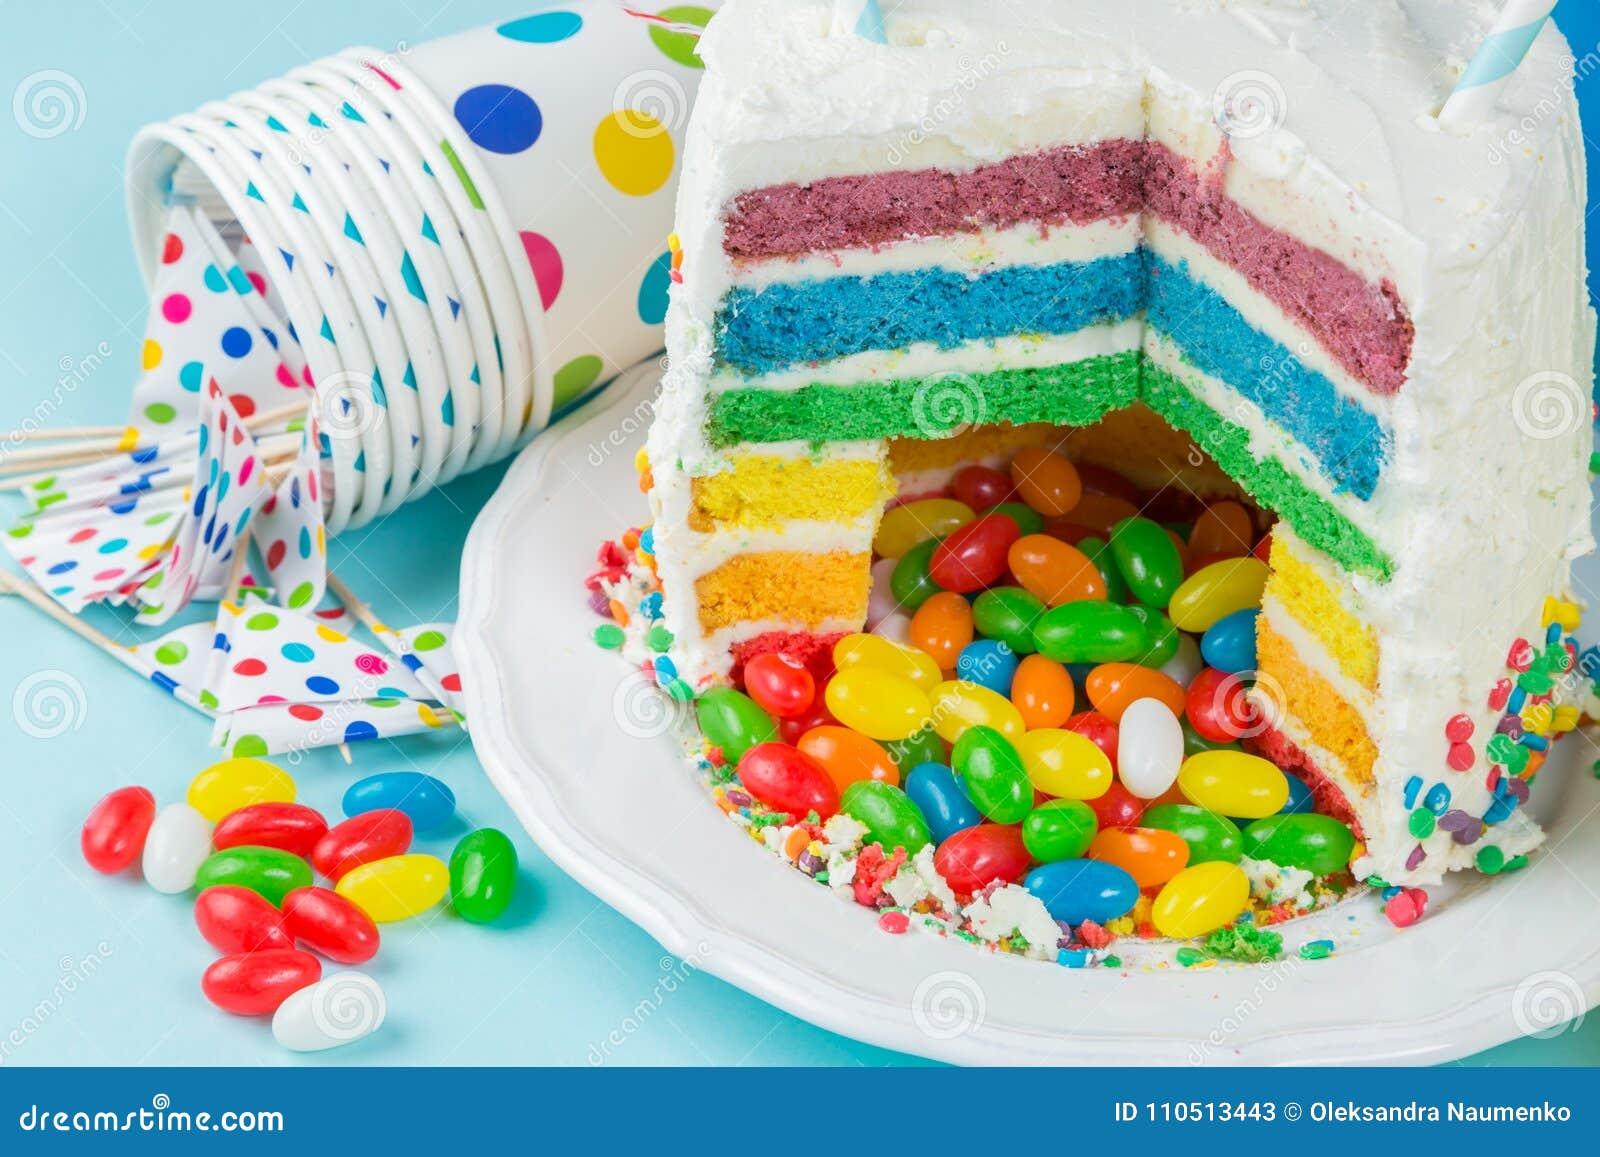 Surprising Rainbow Pinata Cake With Candies Birthday Background Card Funny Birthday Cards Online Benoljebrpdamsfinfo